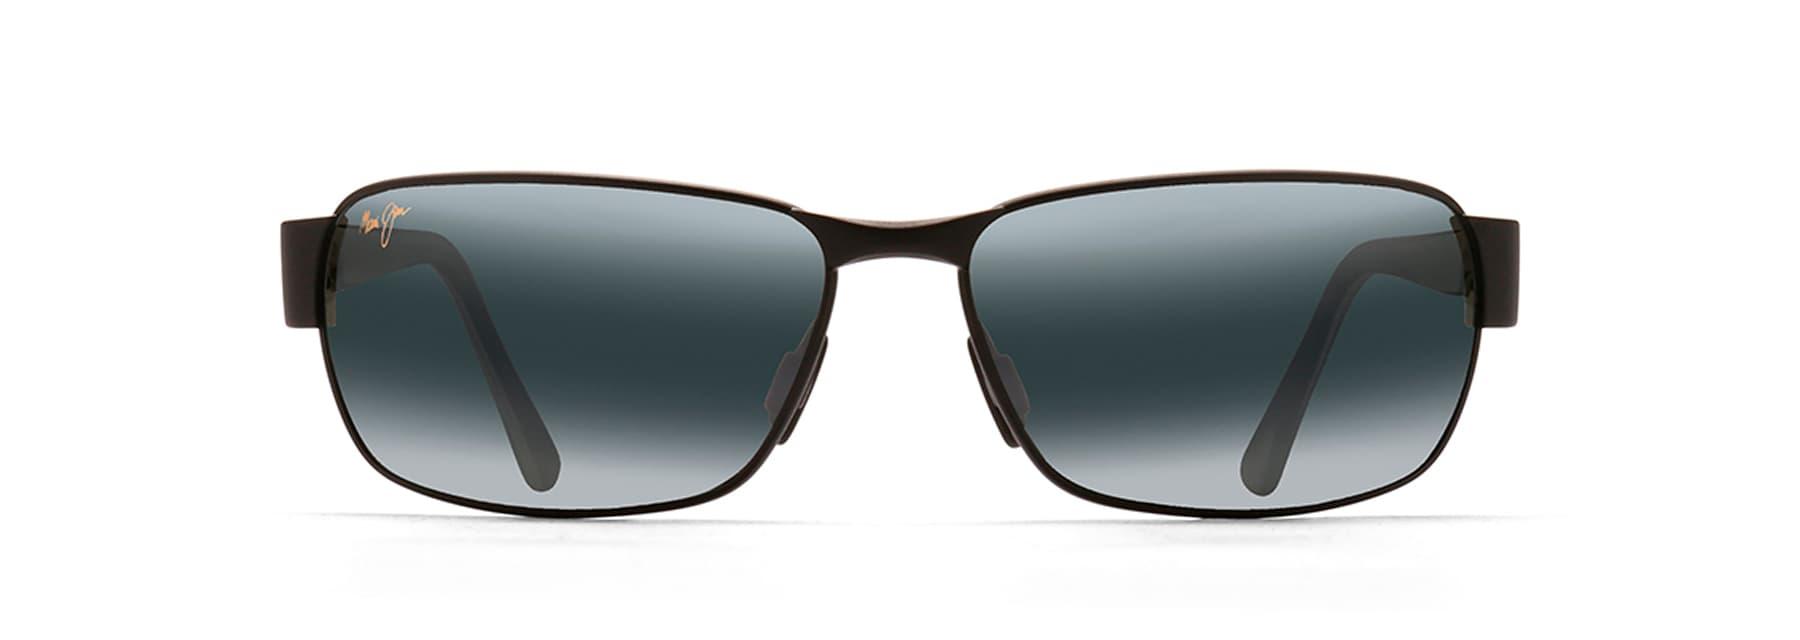 2b4b51a4a0e7 Black Coral Polarized Sunglasses | Maui Jim®